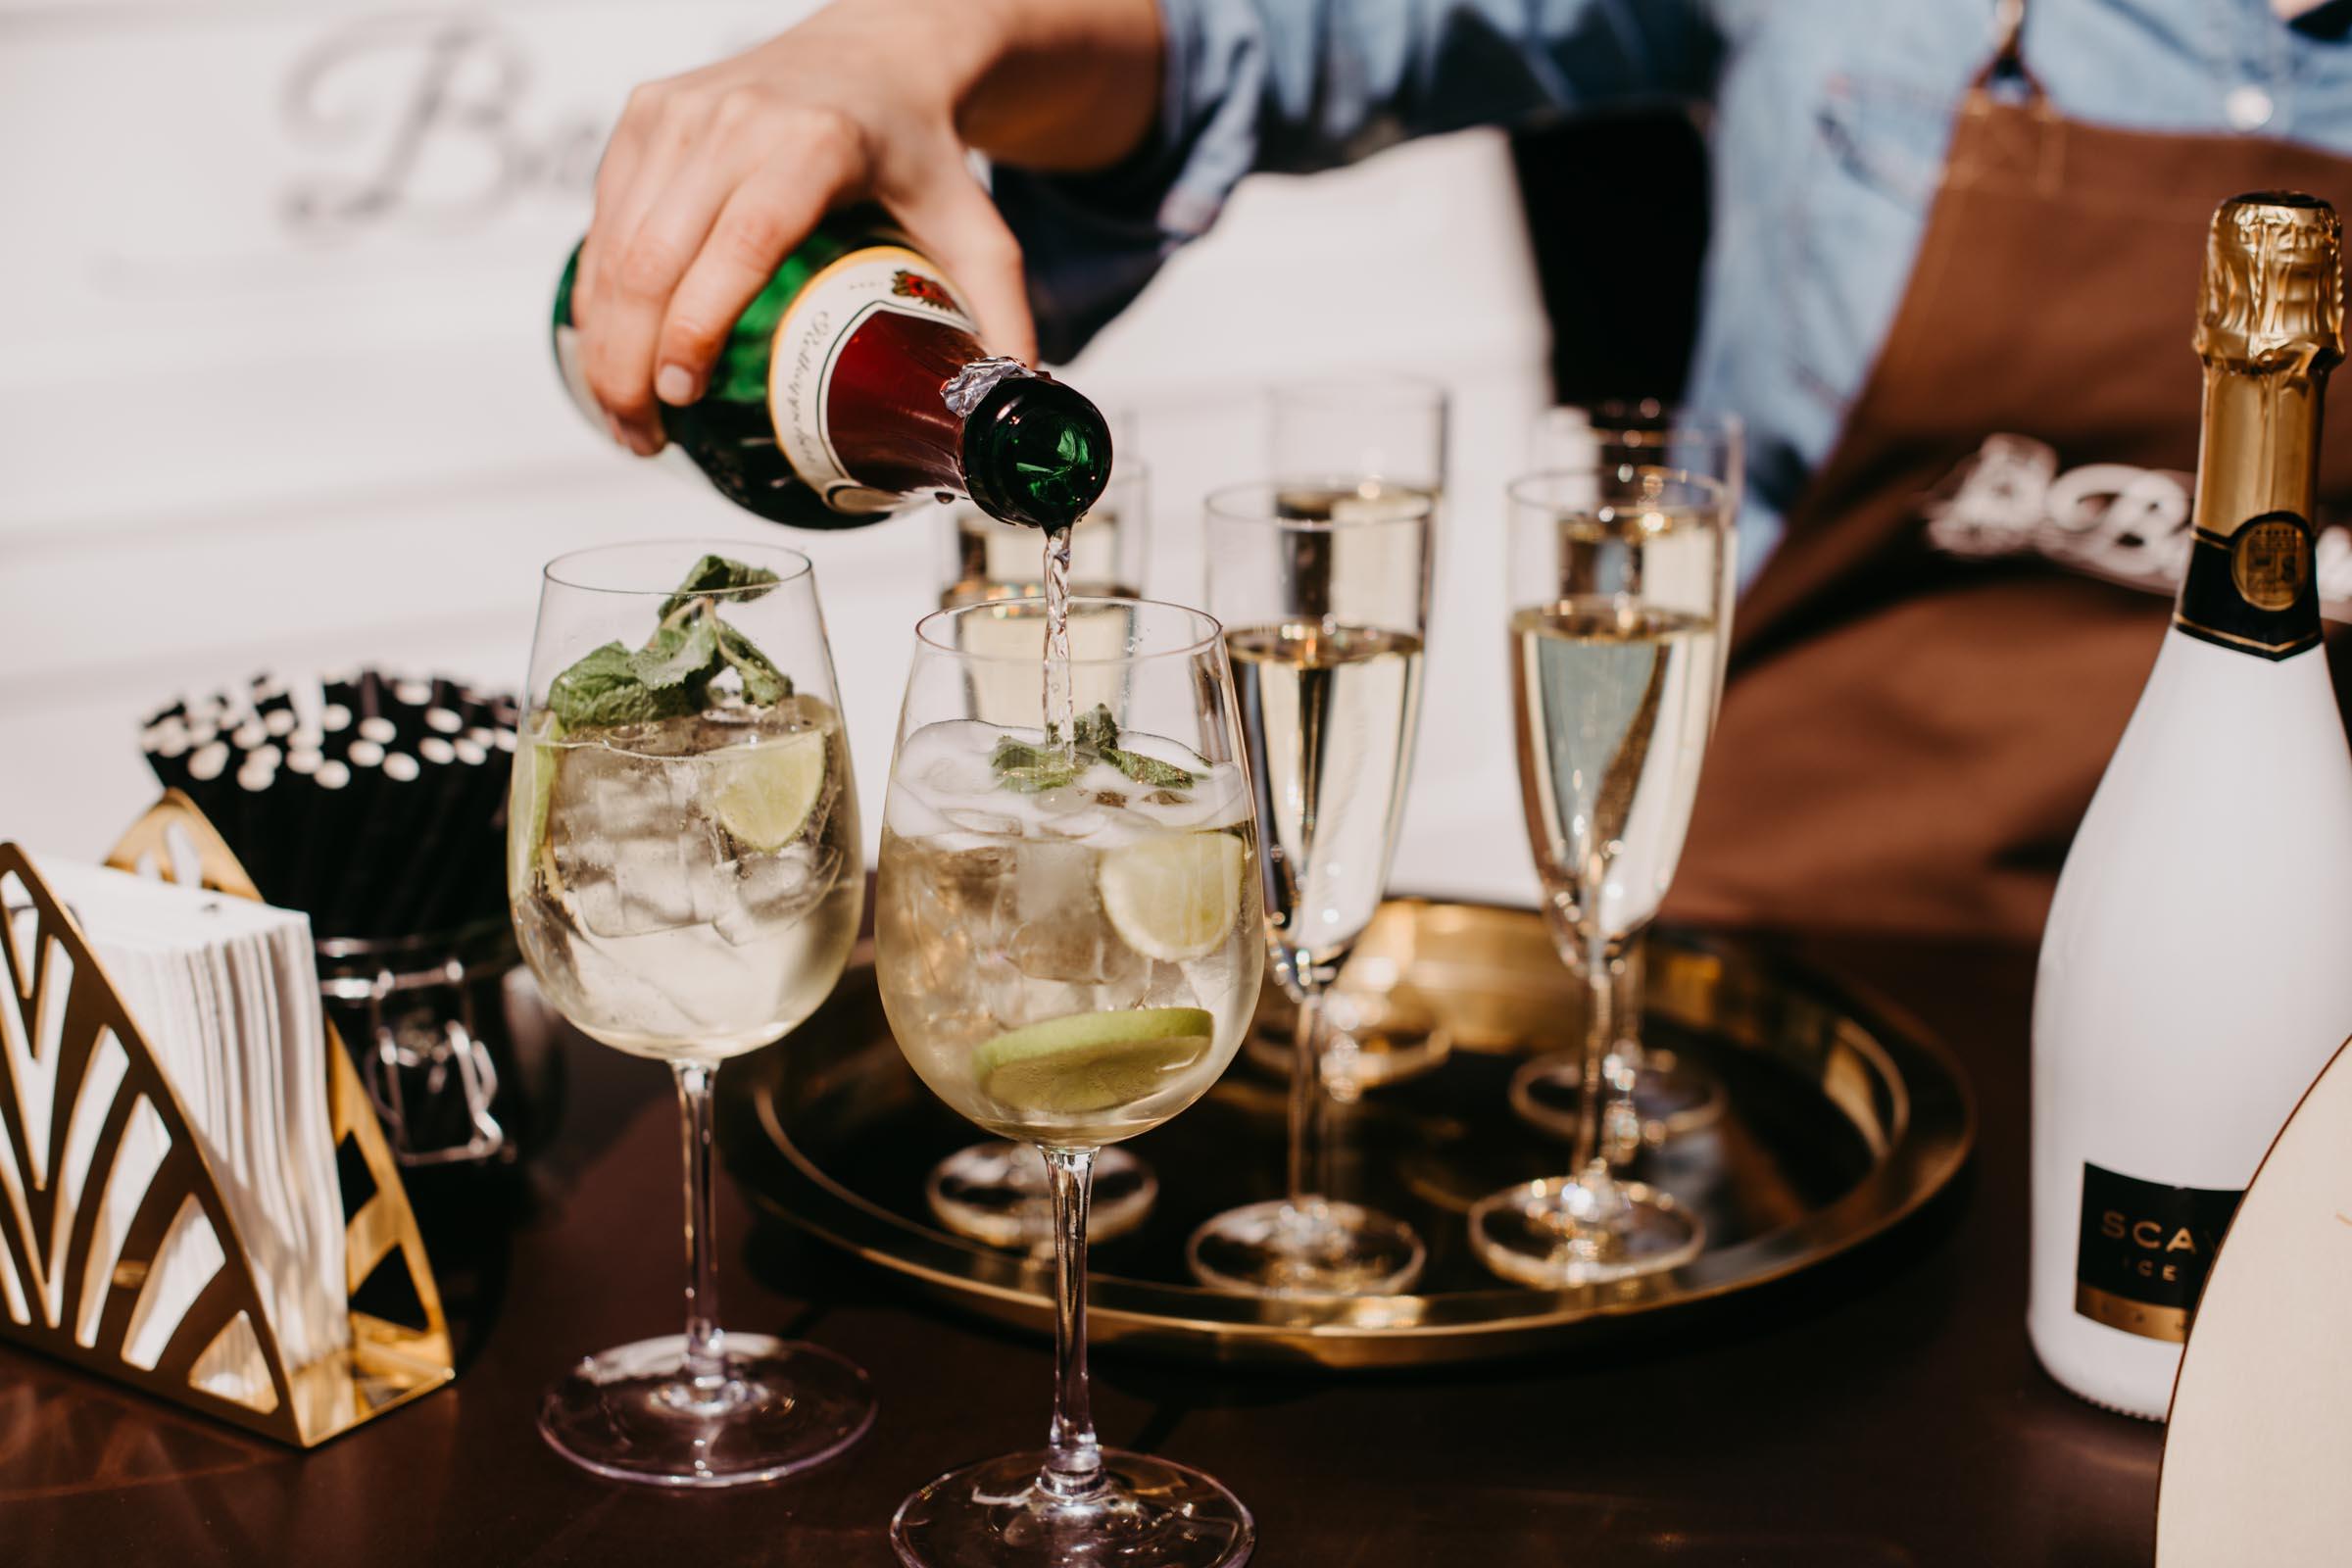 Mobile | Bar | Ape | Bulli | Cocktailservice | Cocktail | Bus | Hannover | Getränke | Catering | Foodtruck | Kuchen | Sektempfang | Standesamt | Hochzeit | Barkeeper | Hochzeit | Event | Mieten | Buchen | Barformat